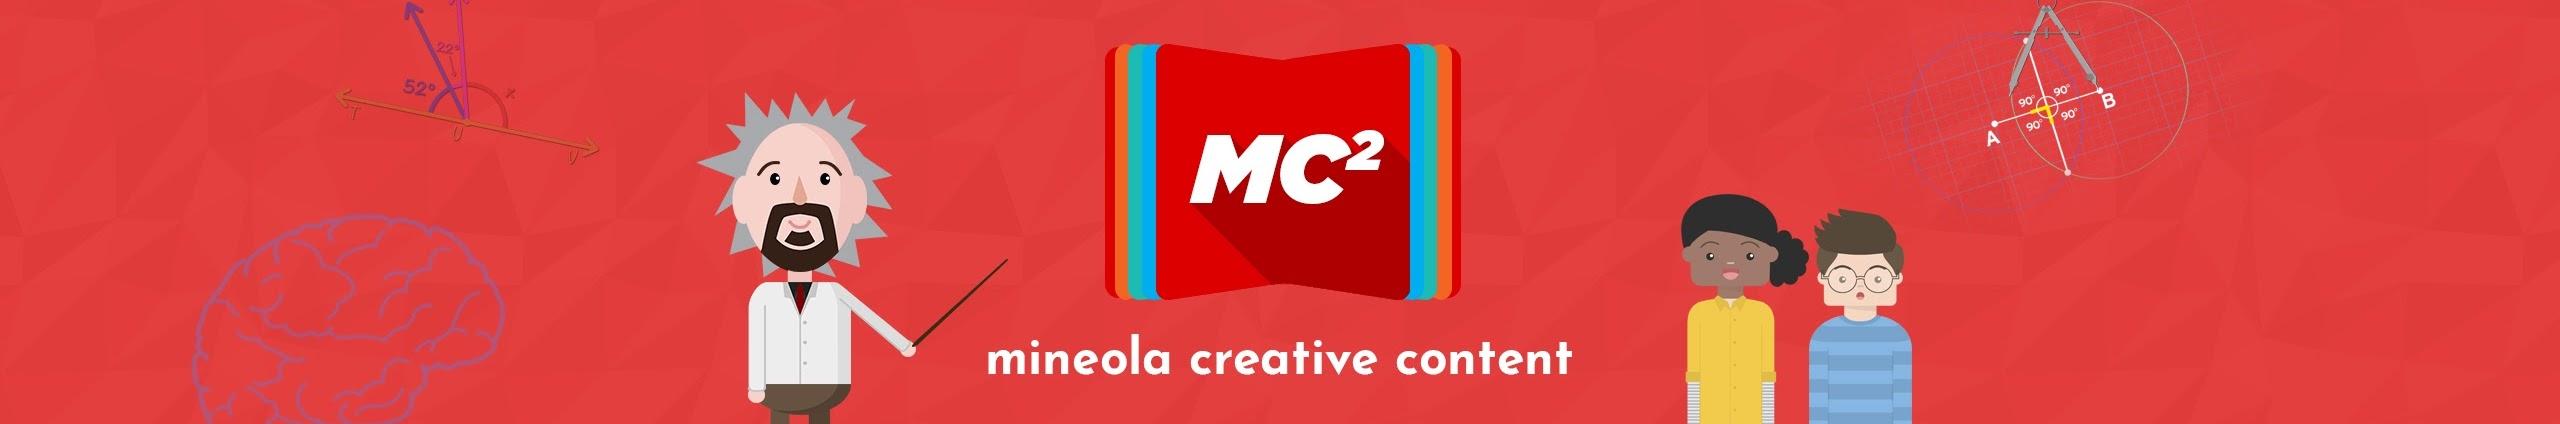 9bbe6cd7bb0c5 Mineola Creative Content - YouTube